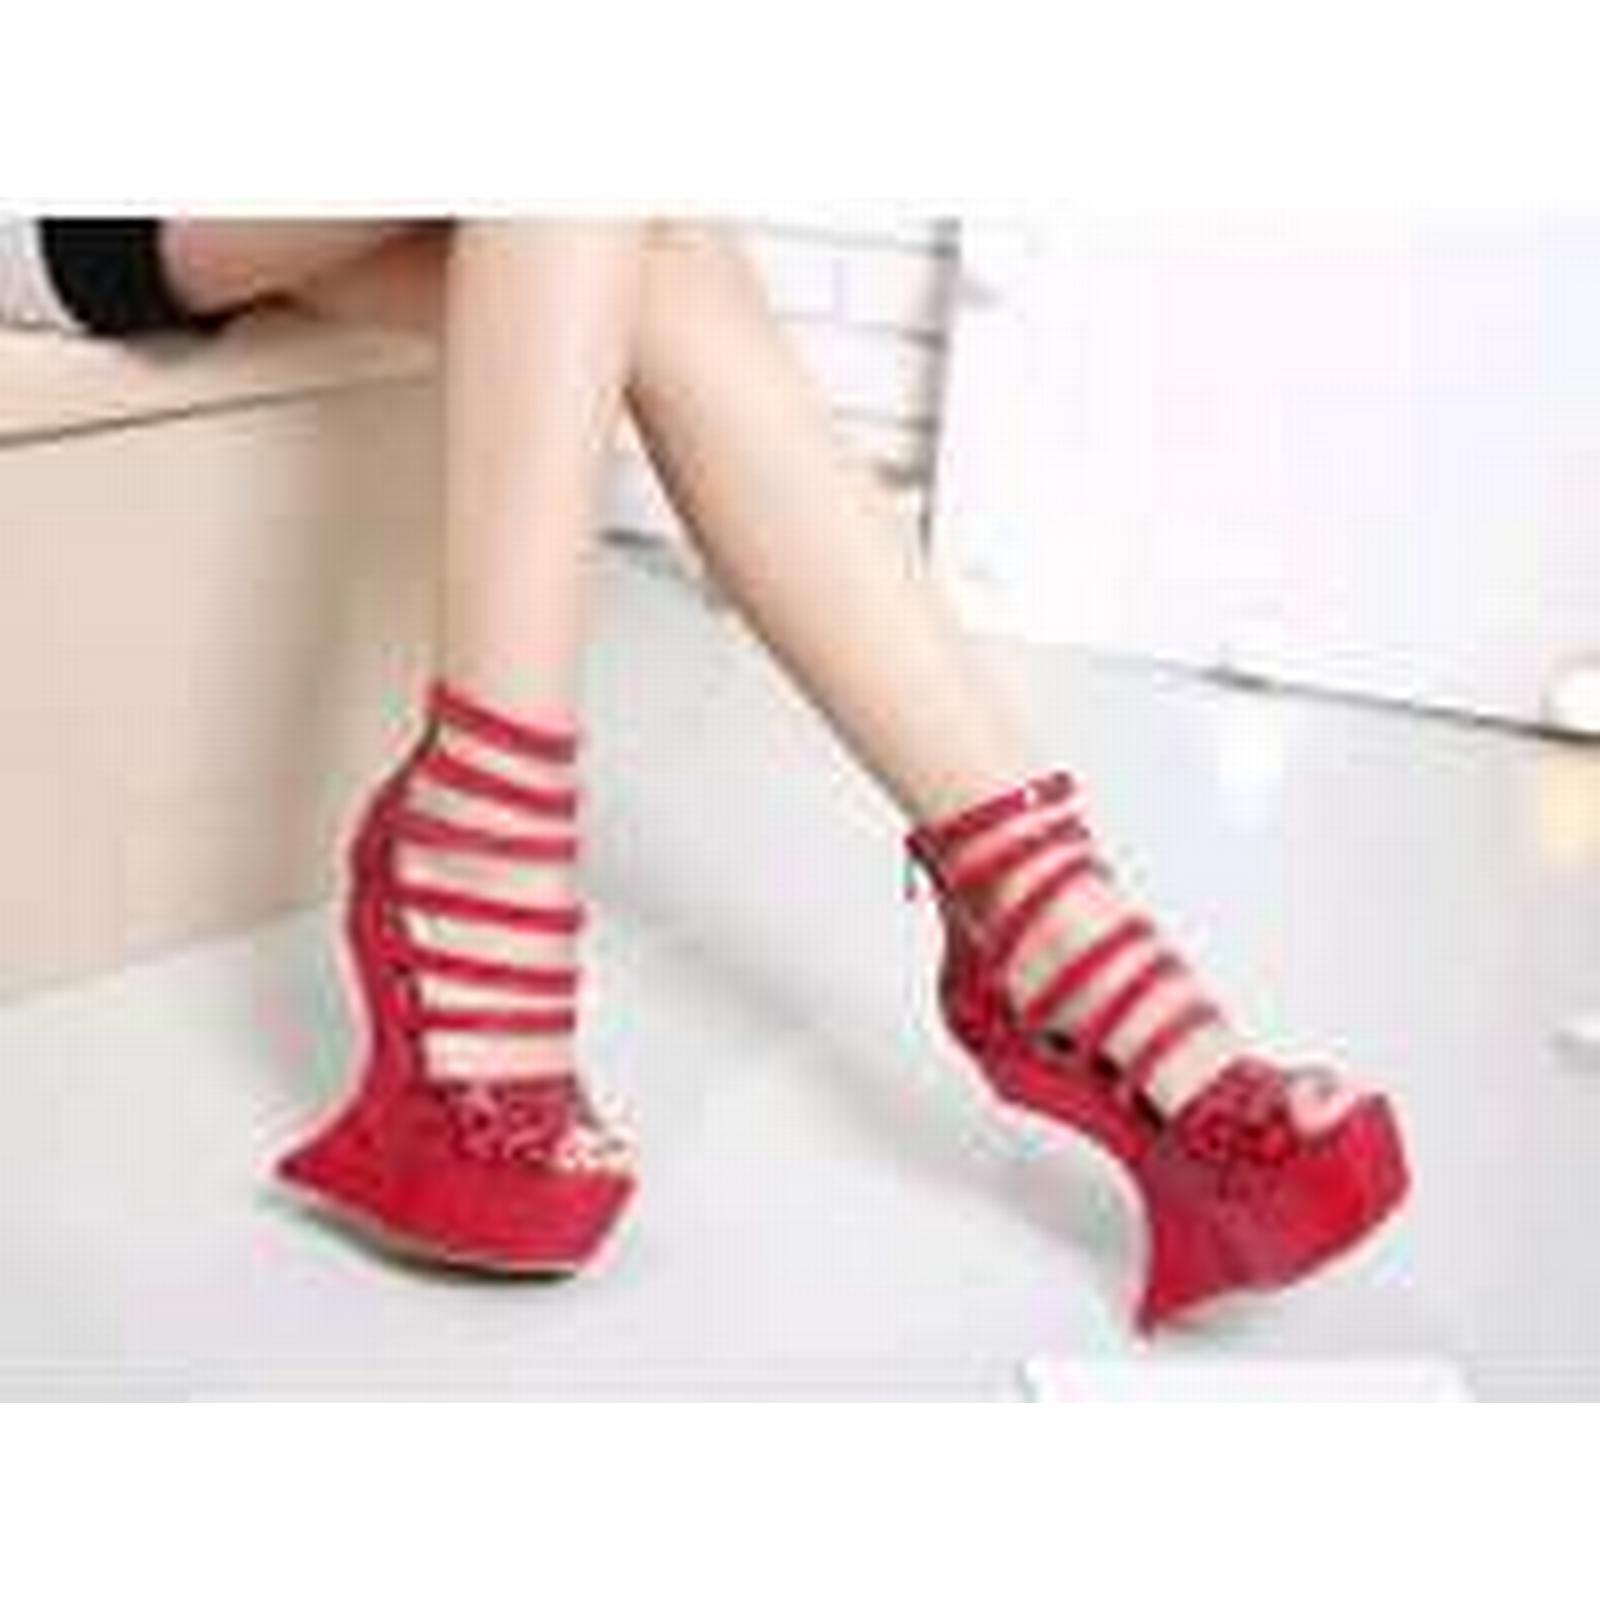 Bonanza sandals, (Global) ps328 cutie strappy alien wedge sandals, Bonanza US Size 4-9, red 9cd0b5